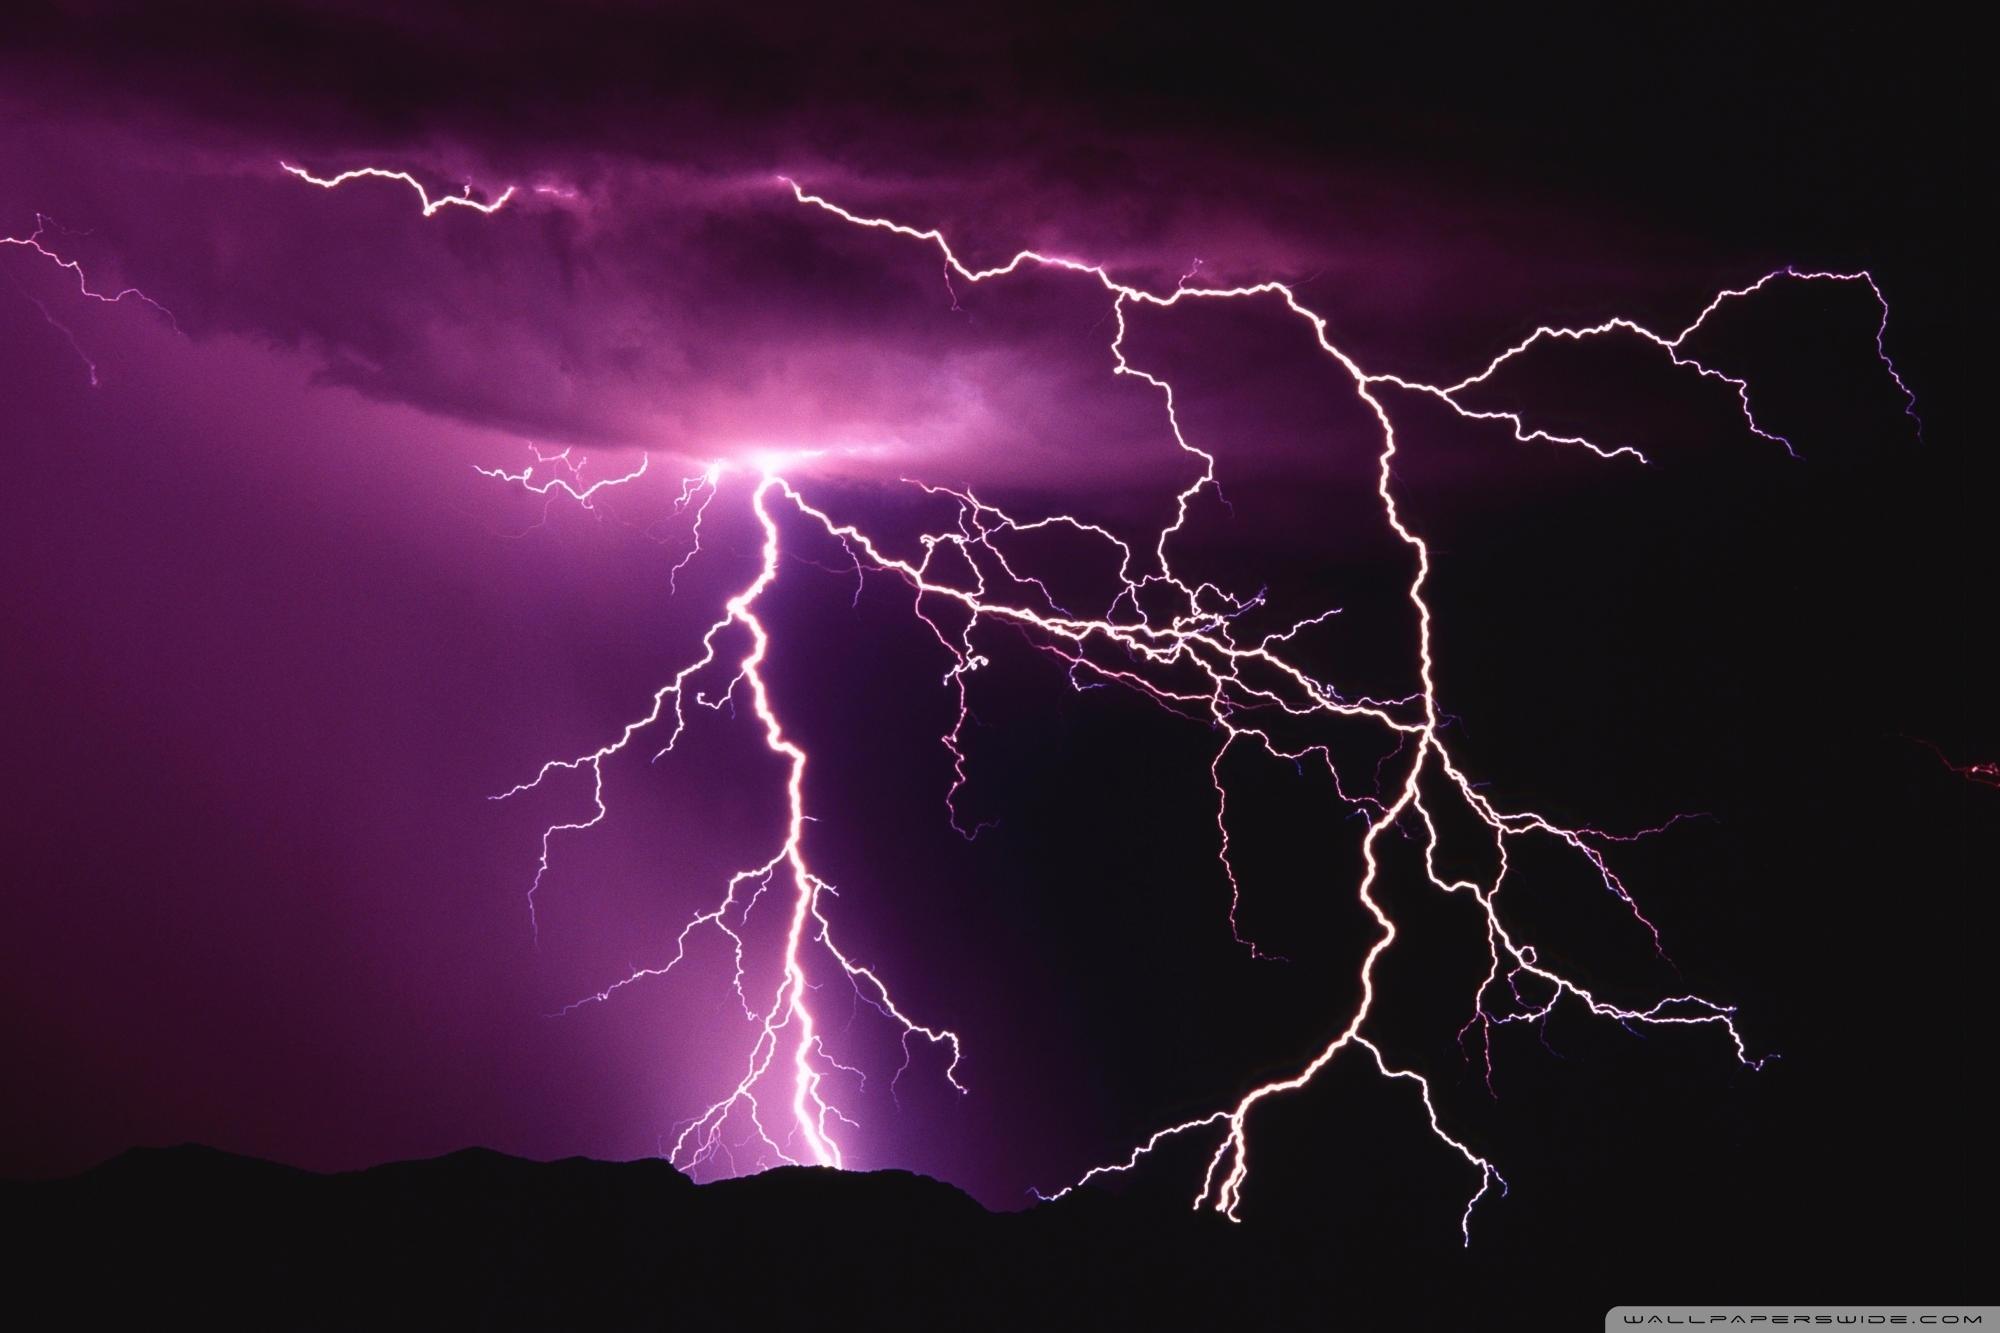 lightning storm ❤ 4k hd desktop wallpaper for 4k ultra hd tv